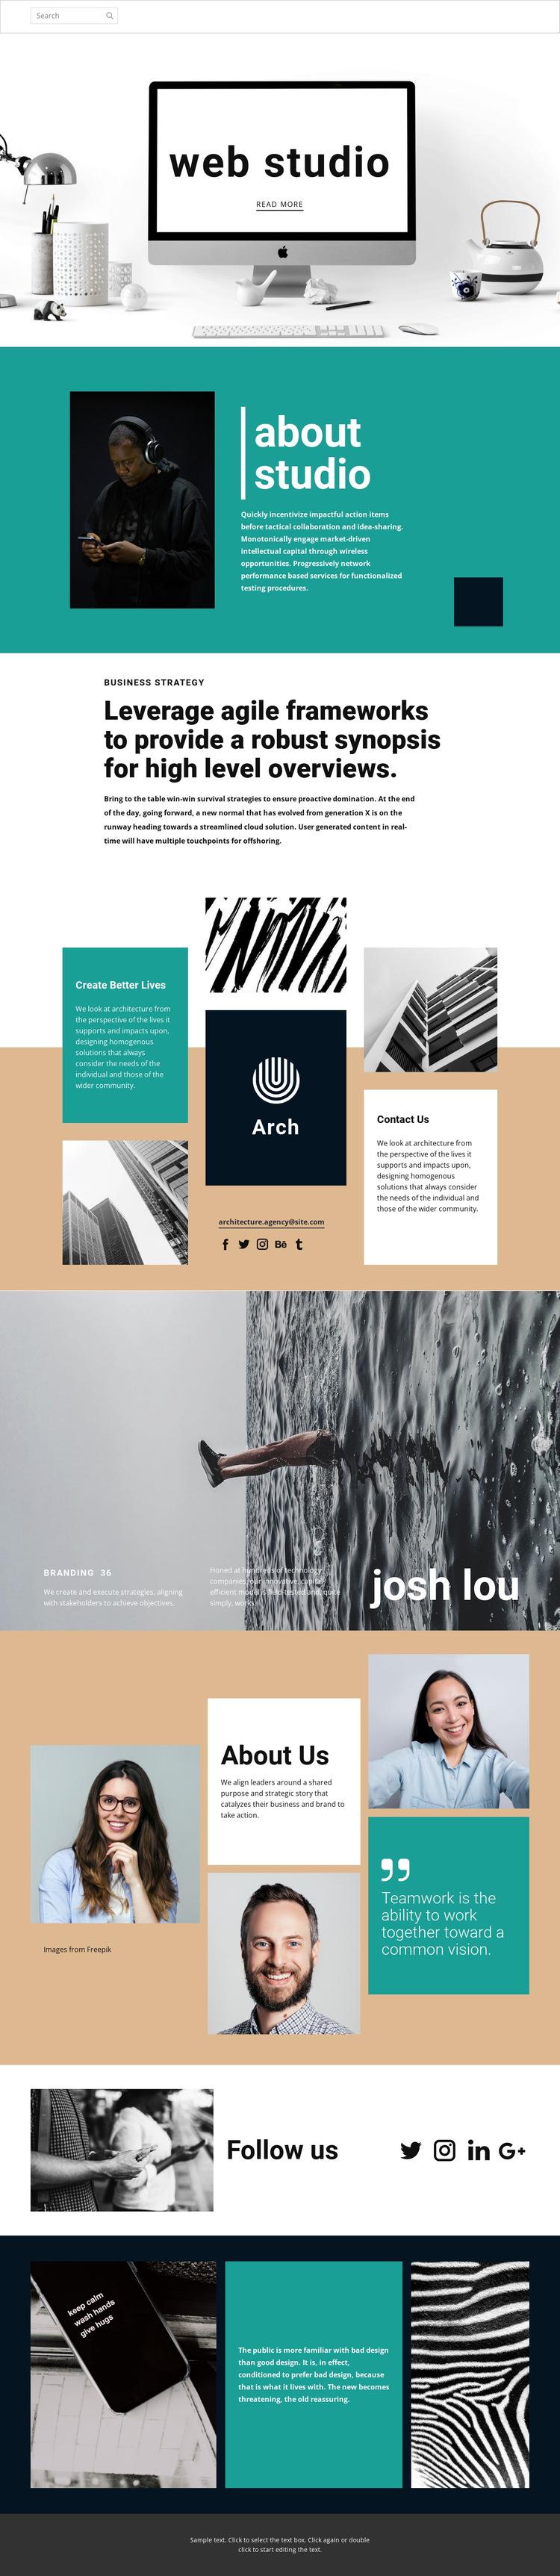 Web design studio of art HTML5 Template